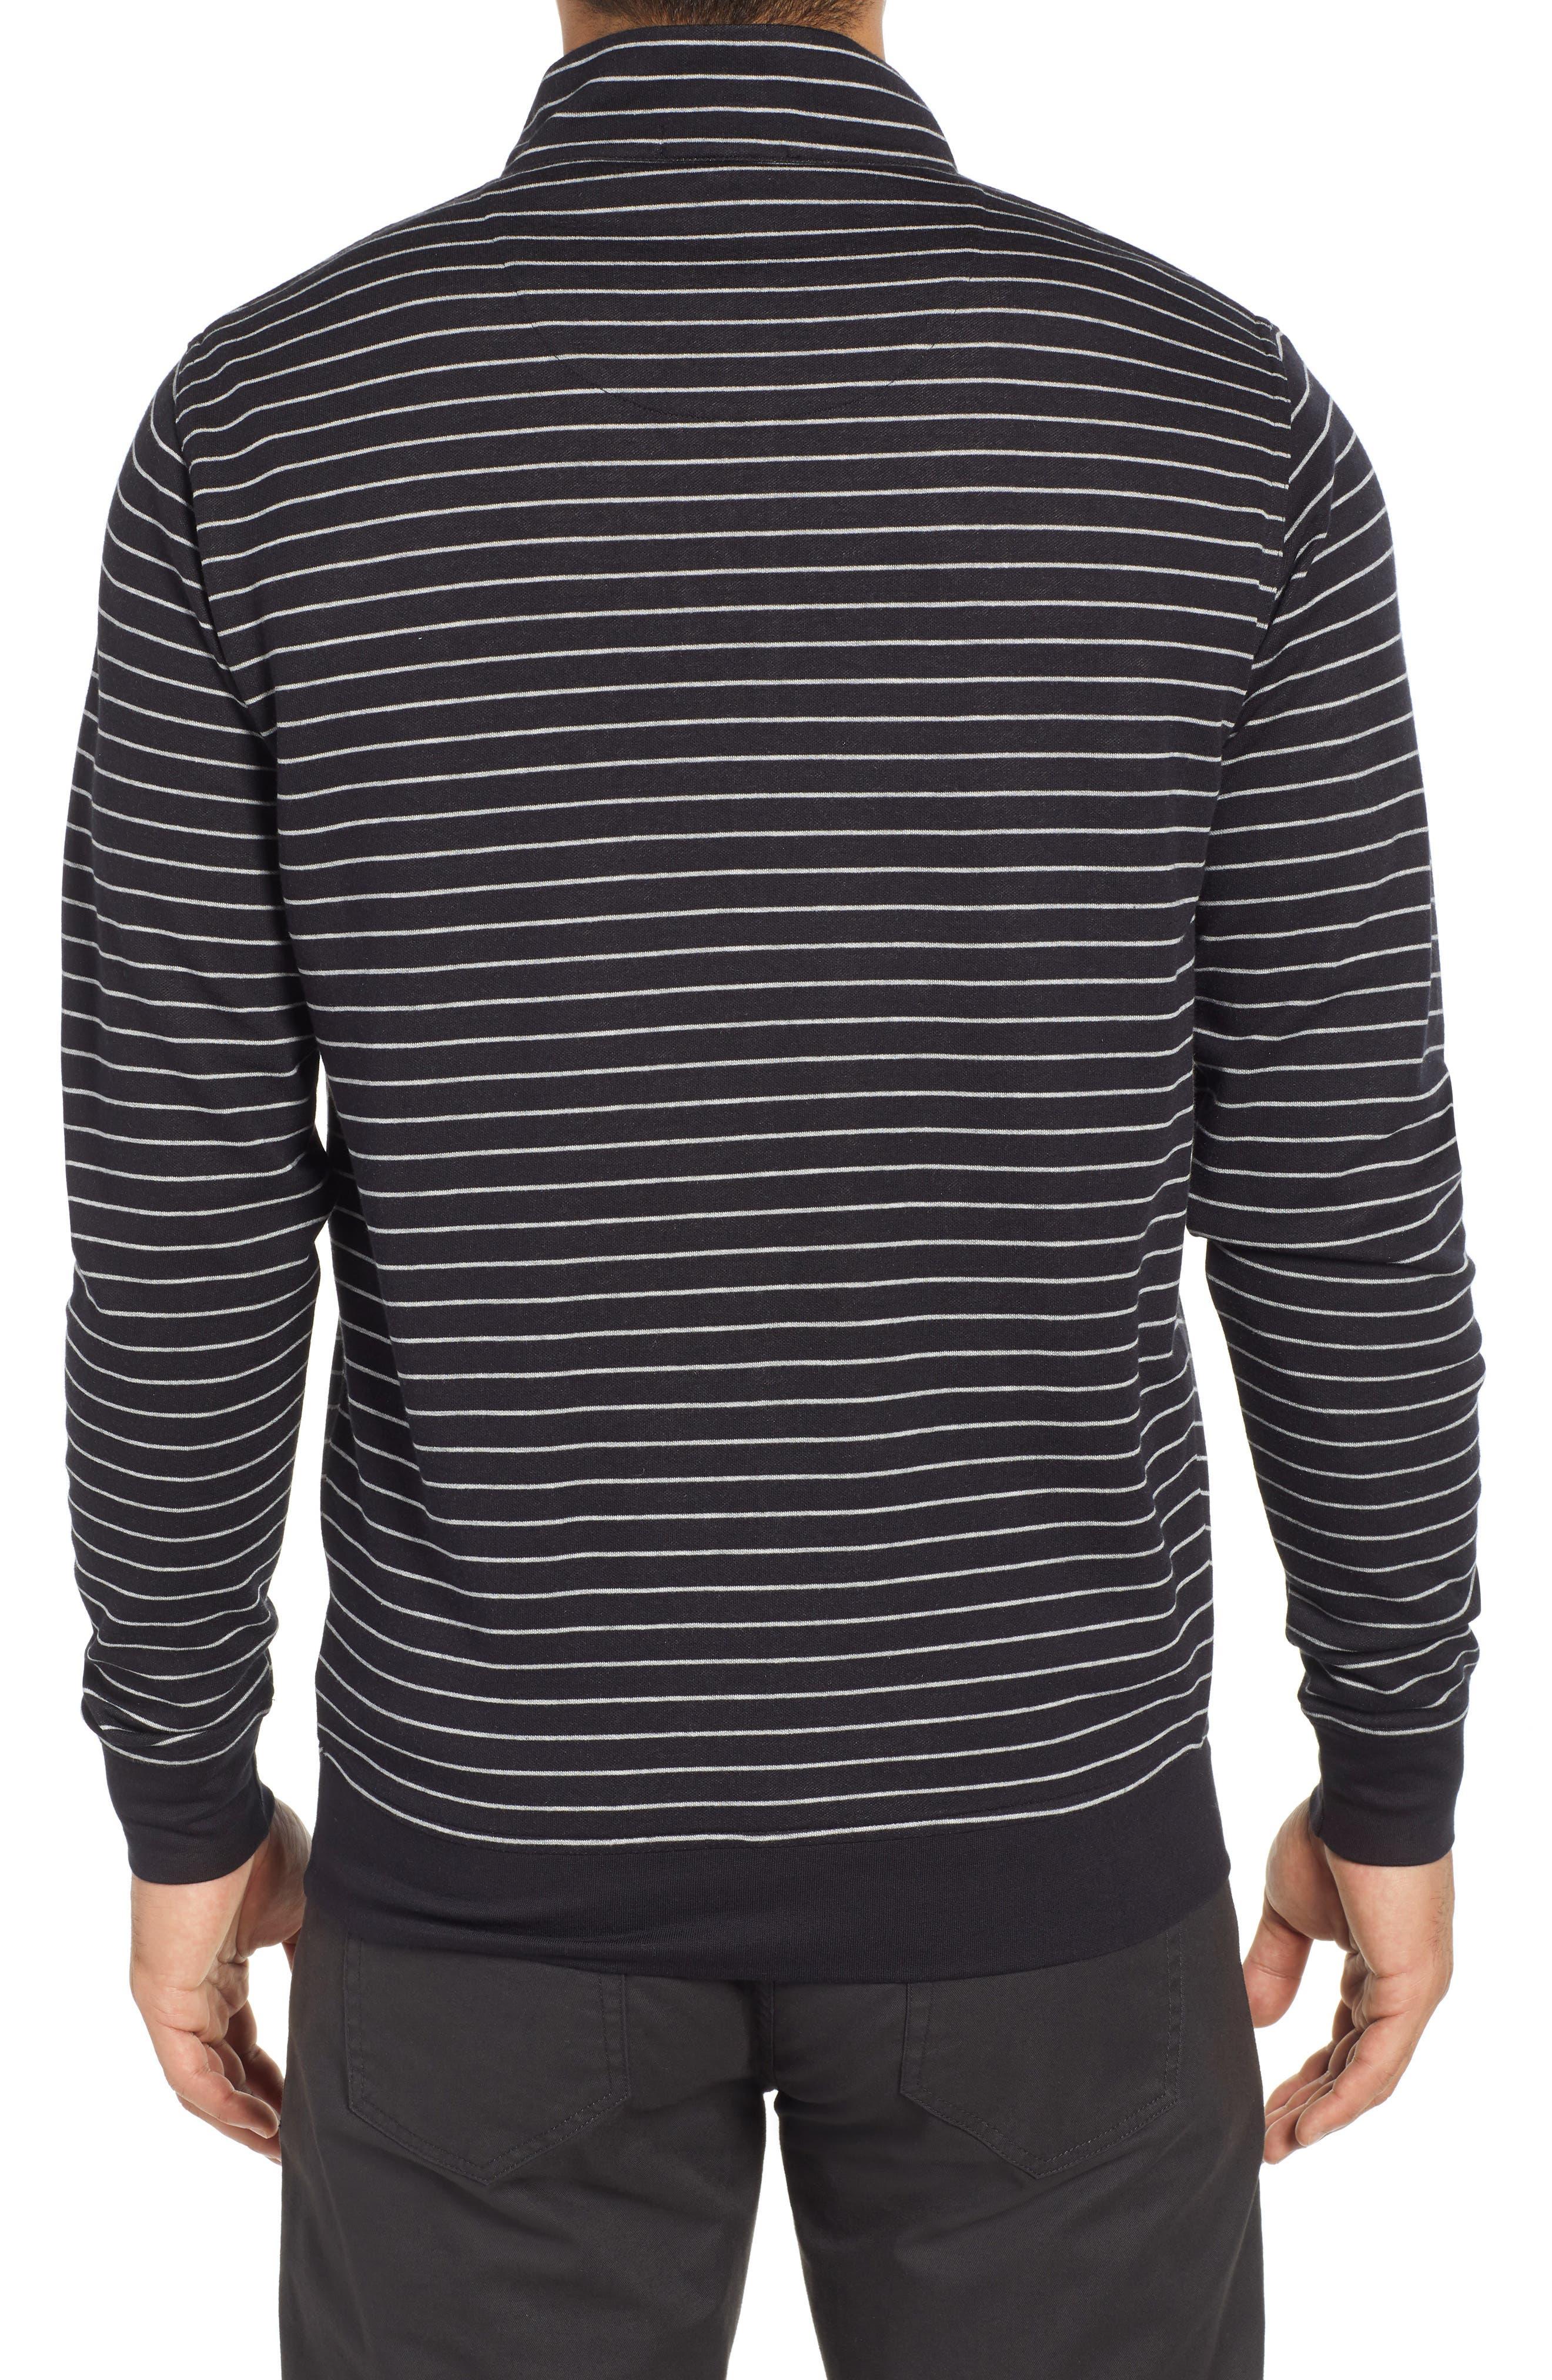 PETER MILLAR, Classic Fit Pullover, Alternate thumbnail 2, color, BLACK